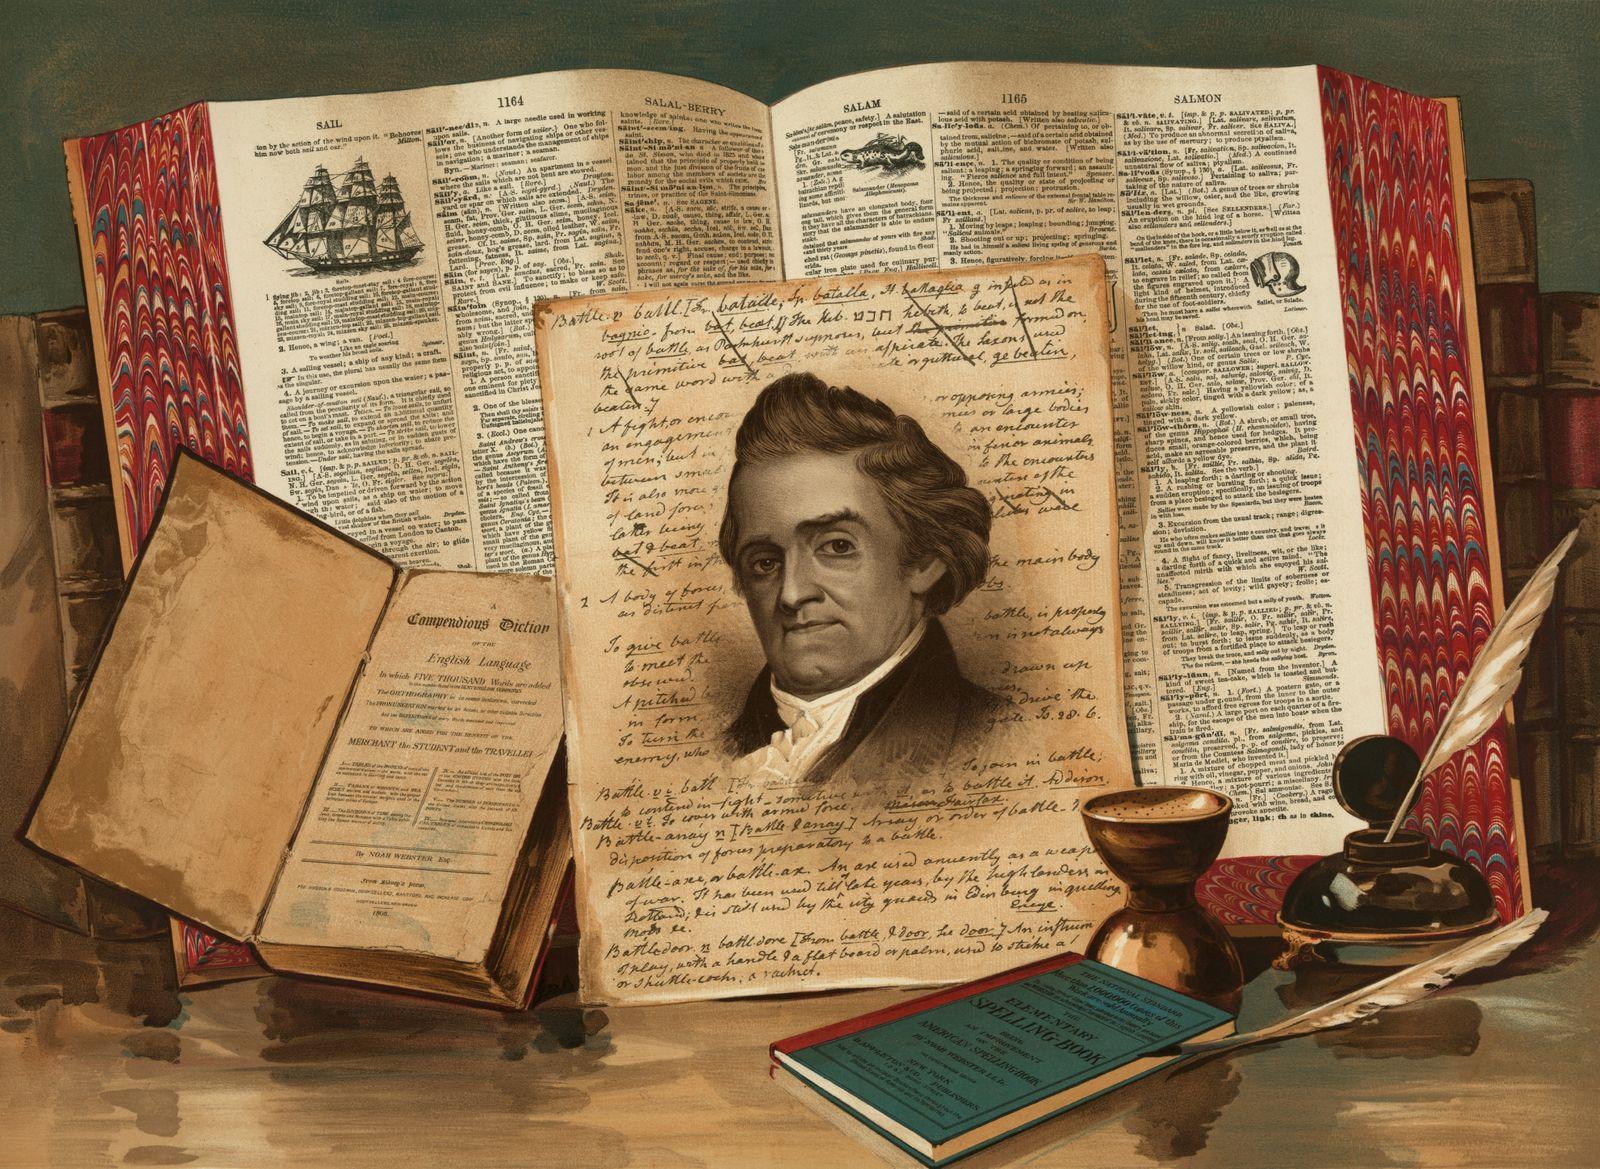 Noah Webster - Schoolmaster of the Republic